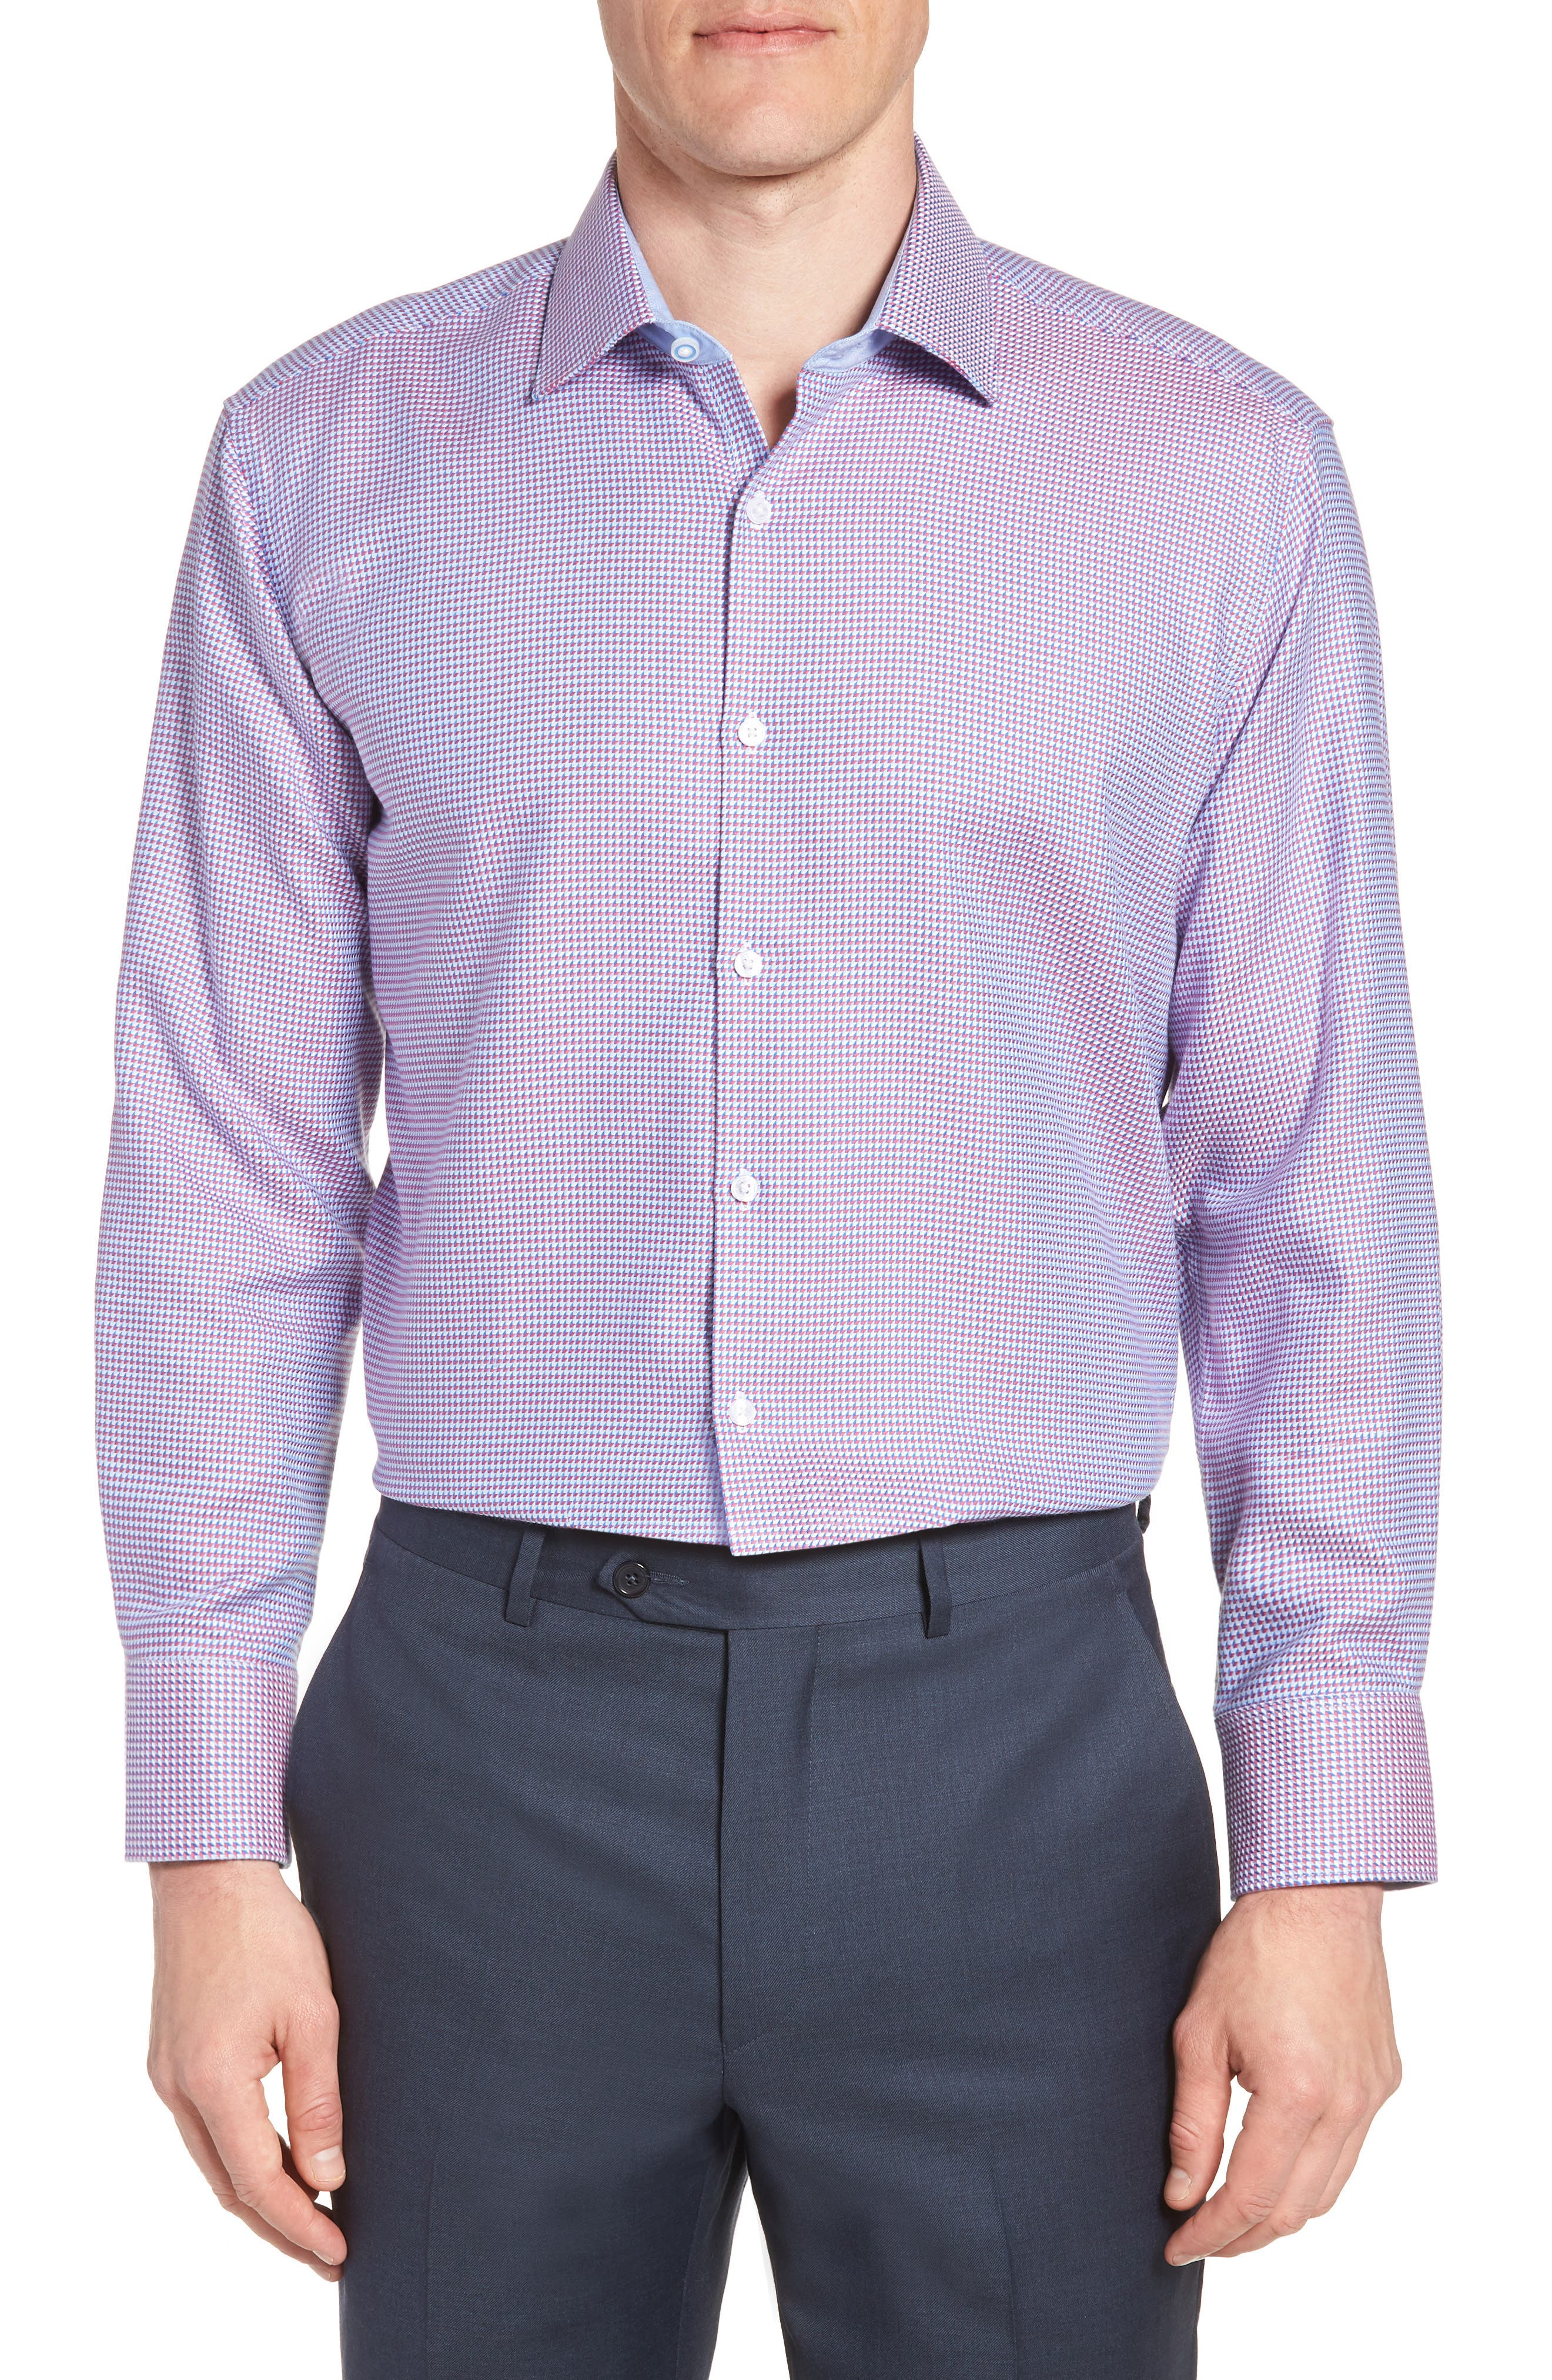 Axton Trim Fit Geometric Dress Shirt,                             Main thumbnail 1, color,                             400